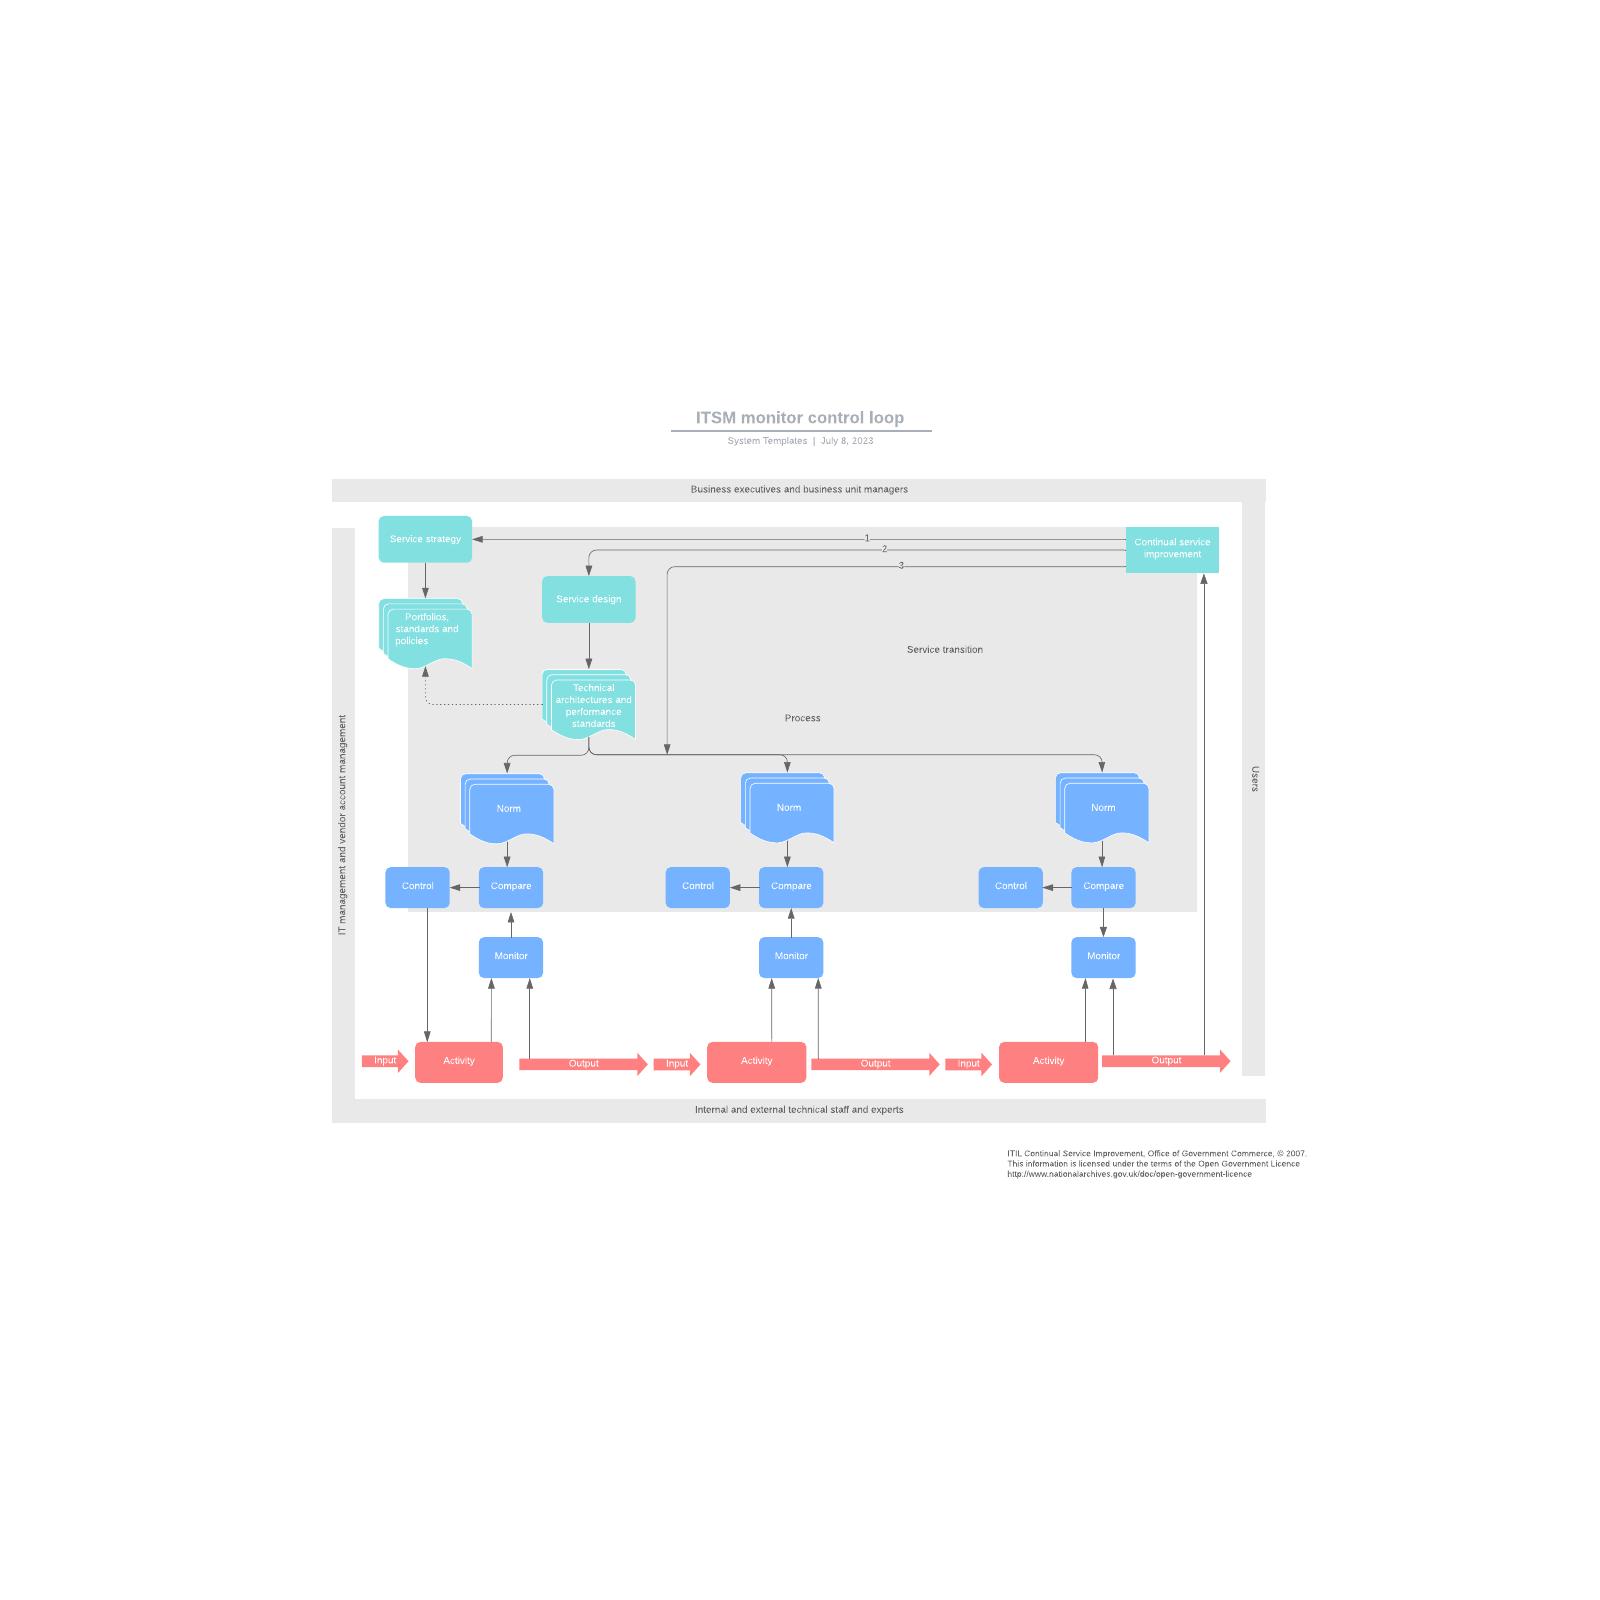 ITSM monitor control loop